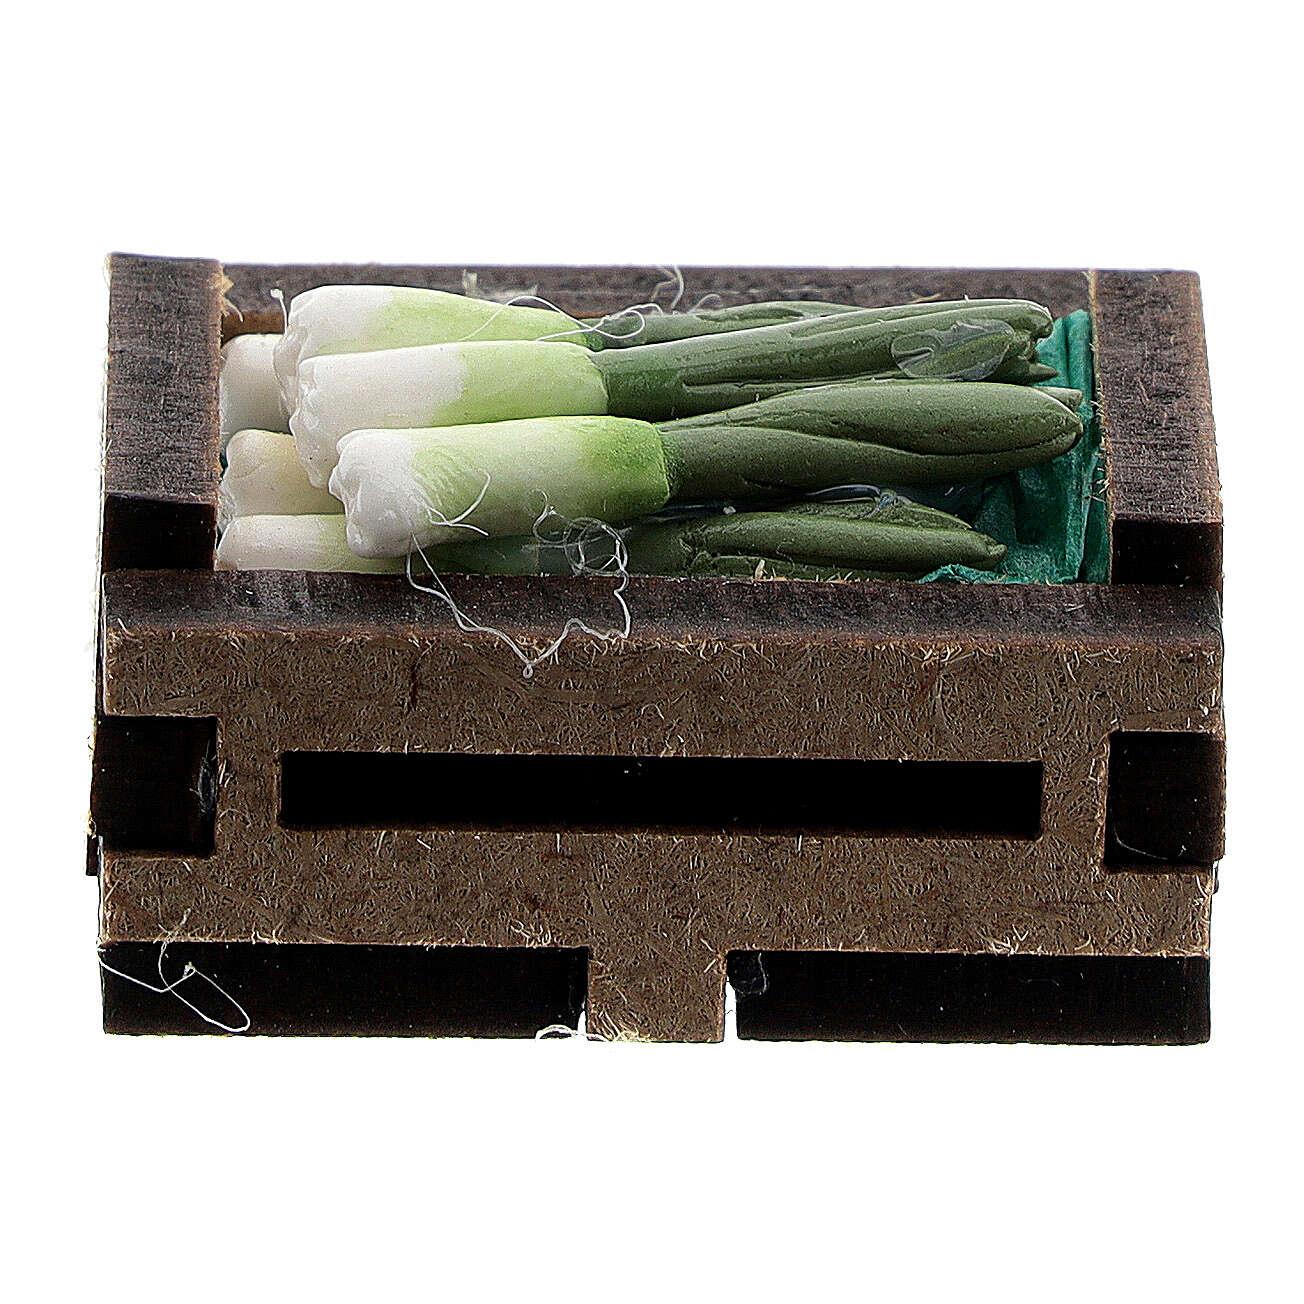 Cassa cipolle resina presepe 10-12 cm 4